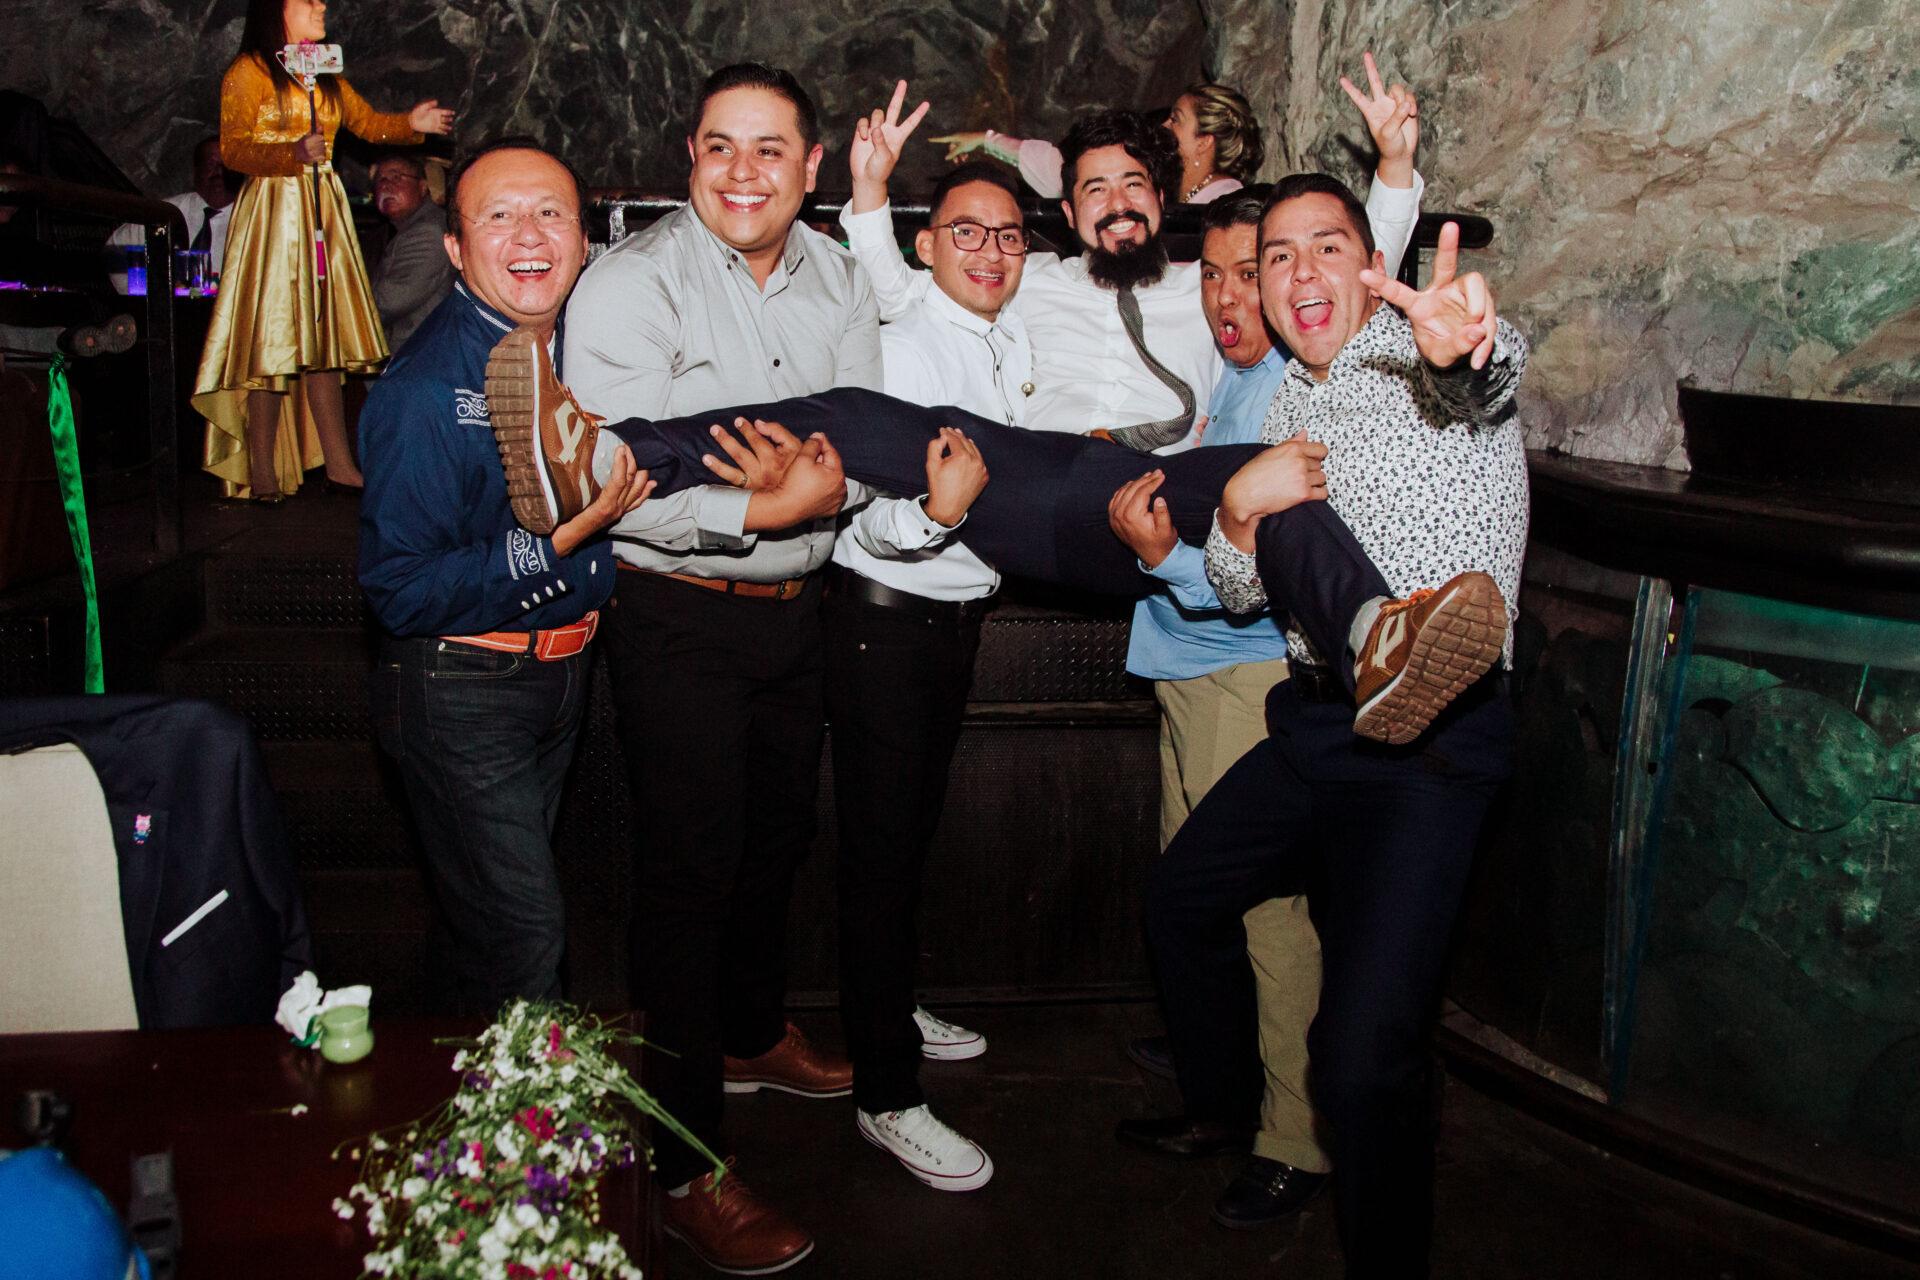 javier_noriega_fotografo_bodas_la_mina_club_zacatecas_wedding_photographer23